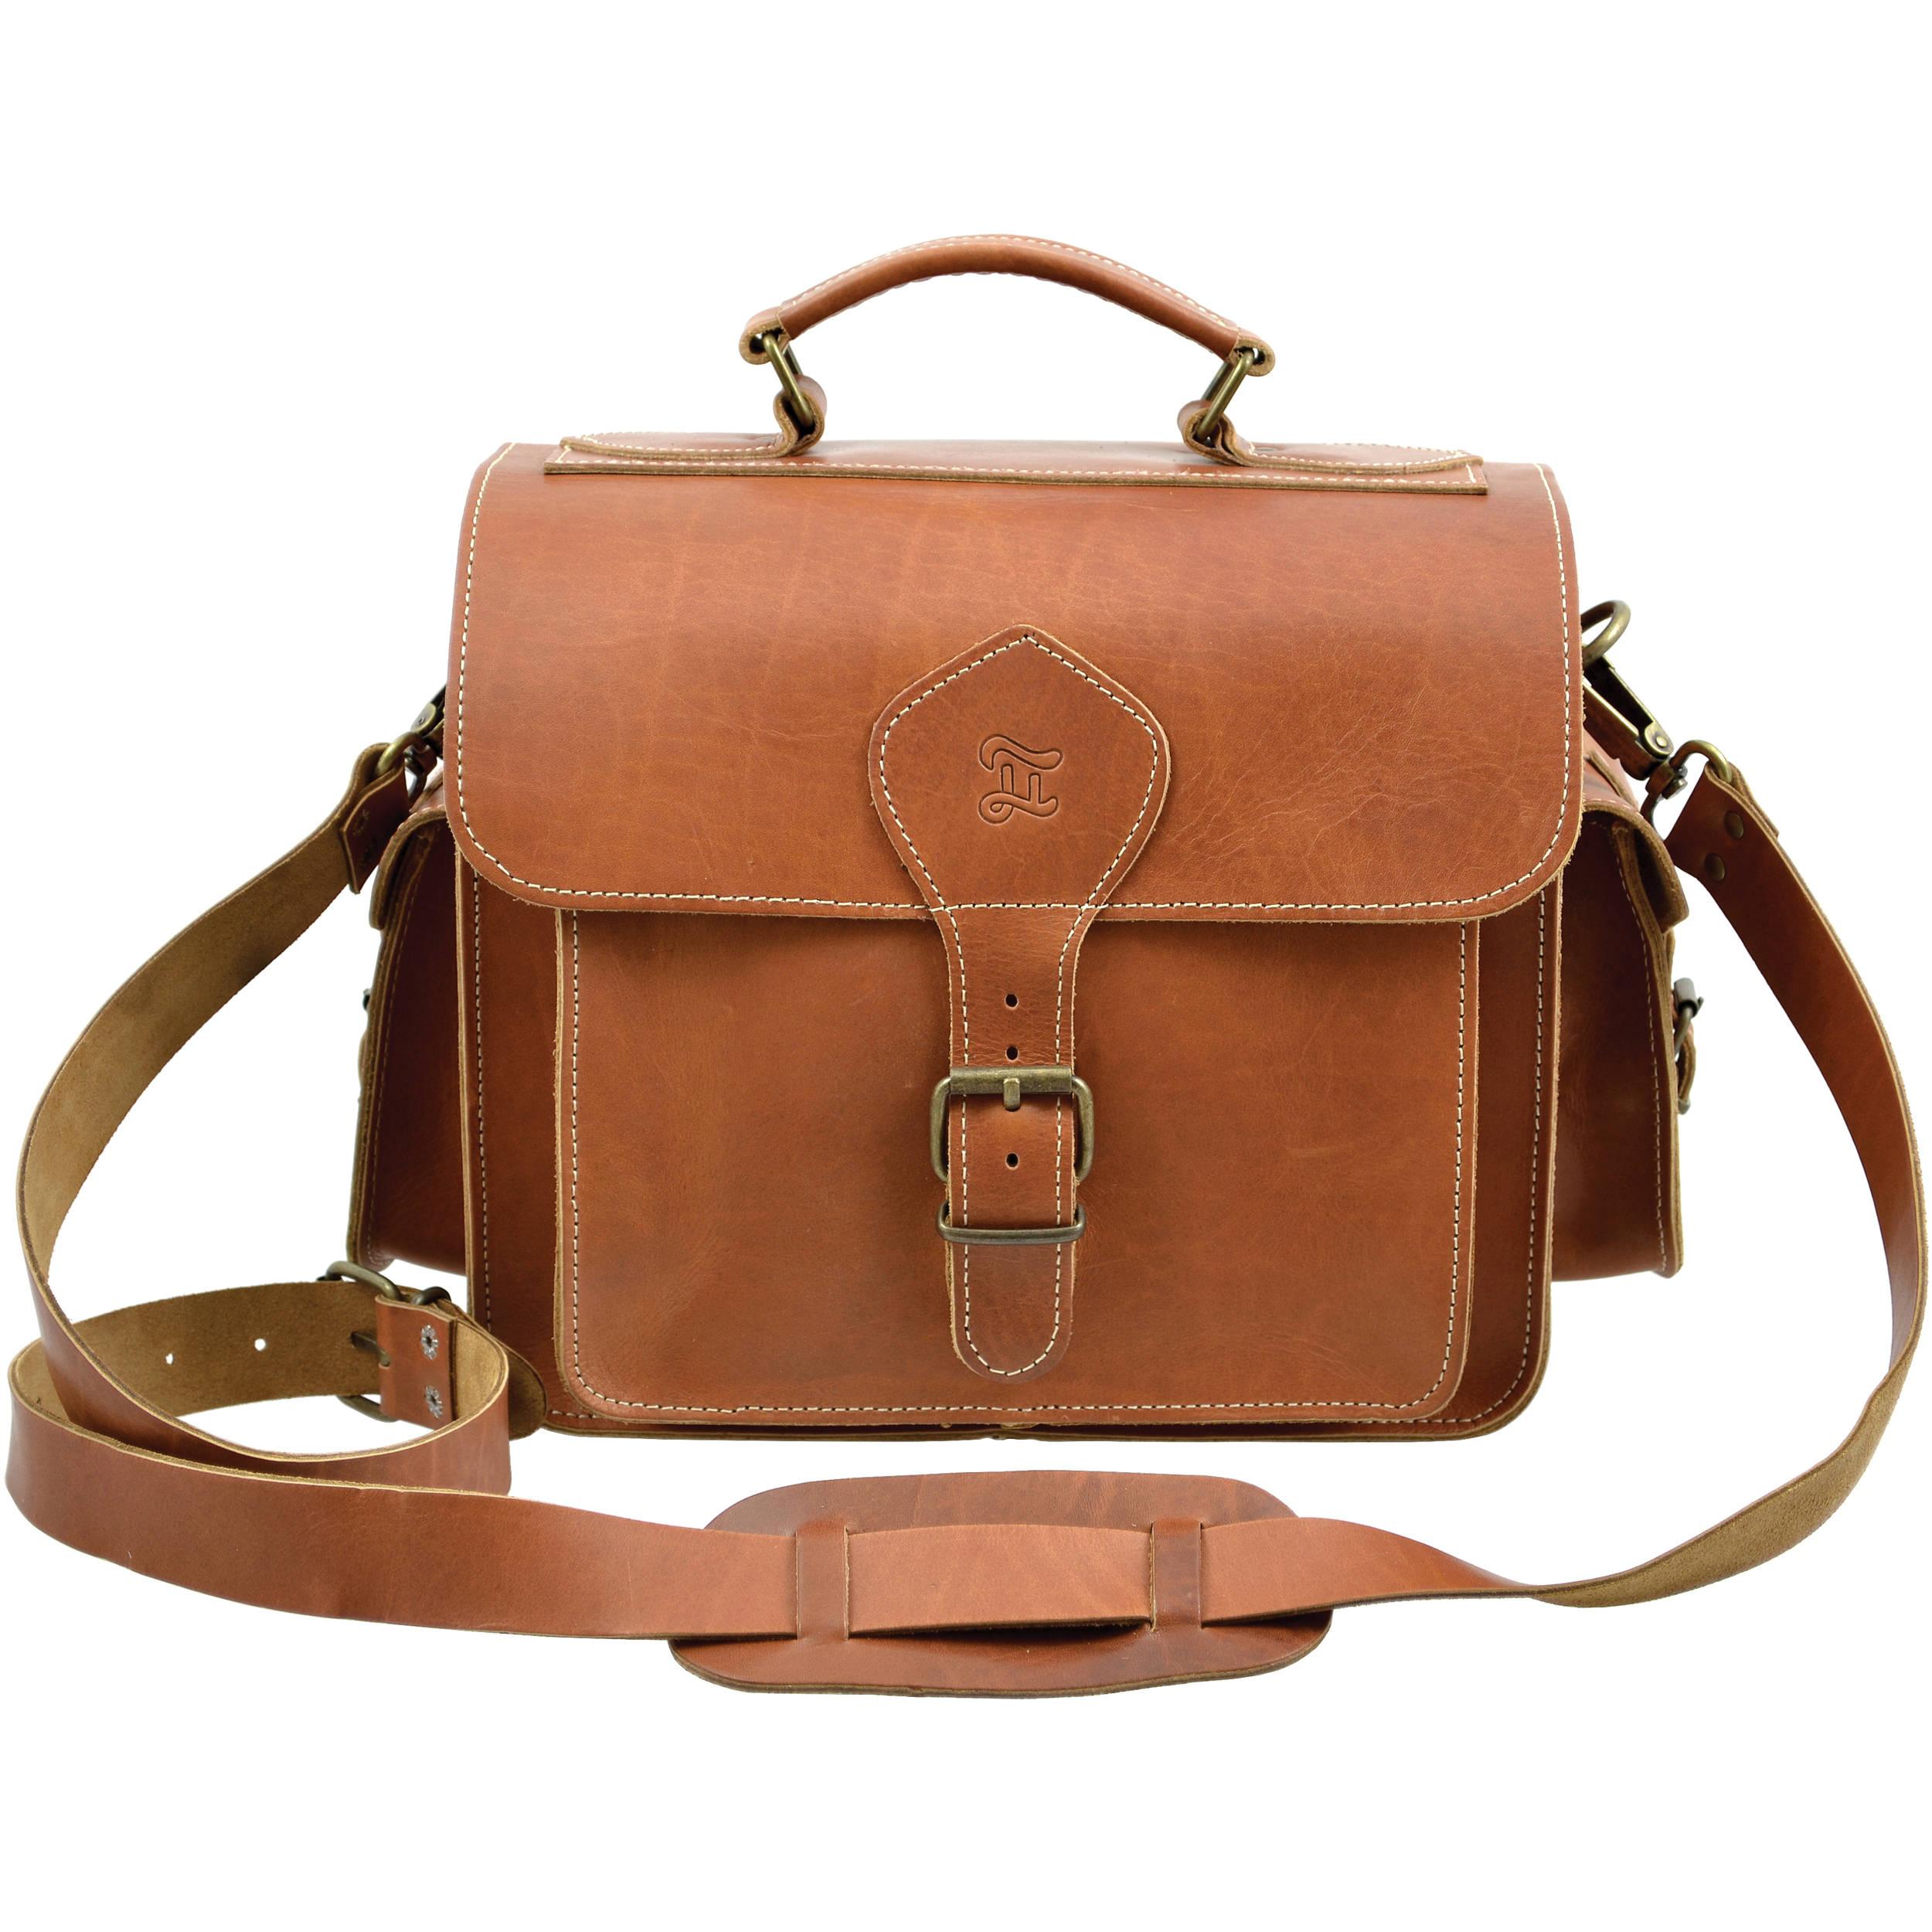 Grafea England Leather Camera Bag Regular Size Caramel